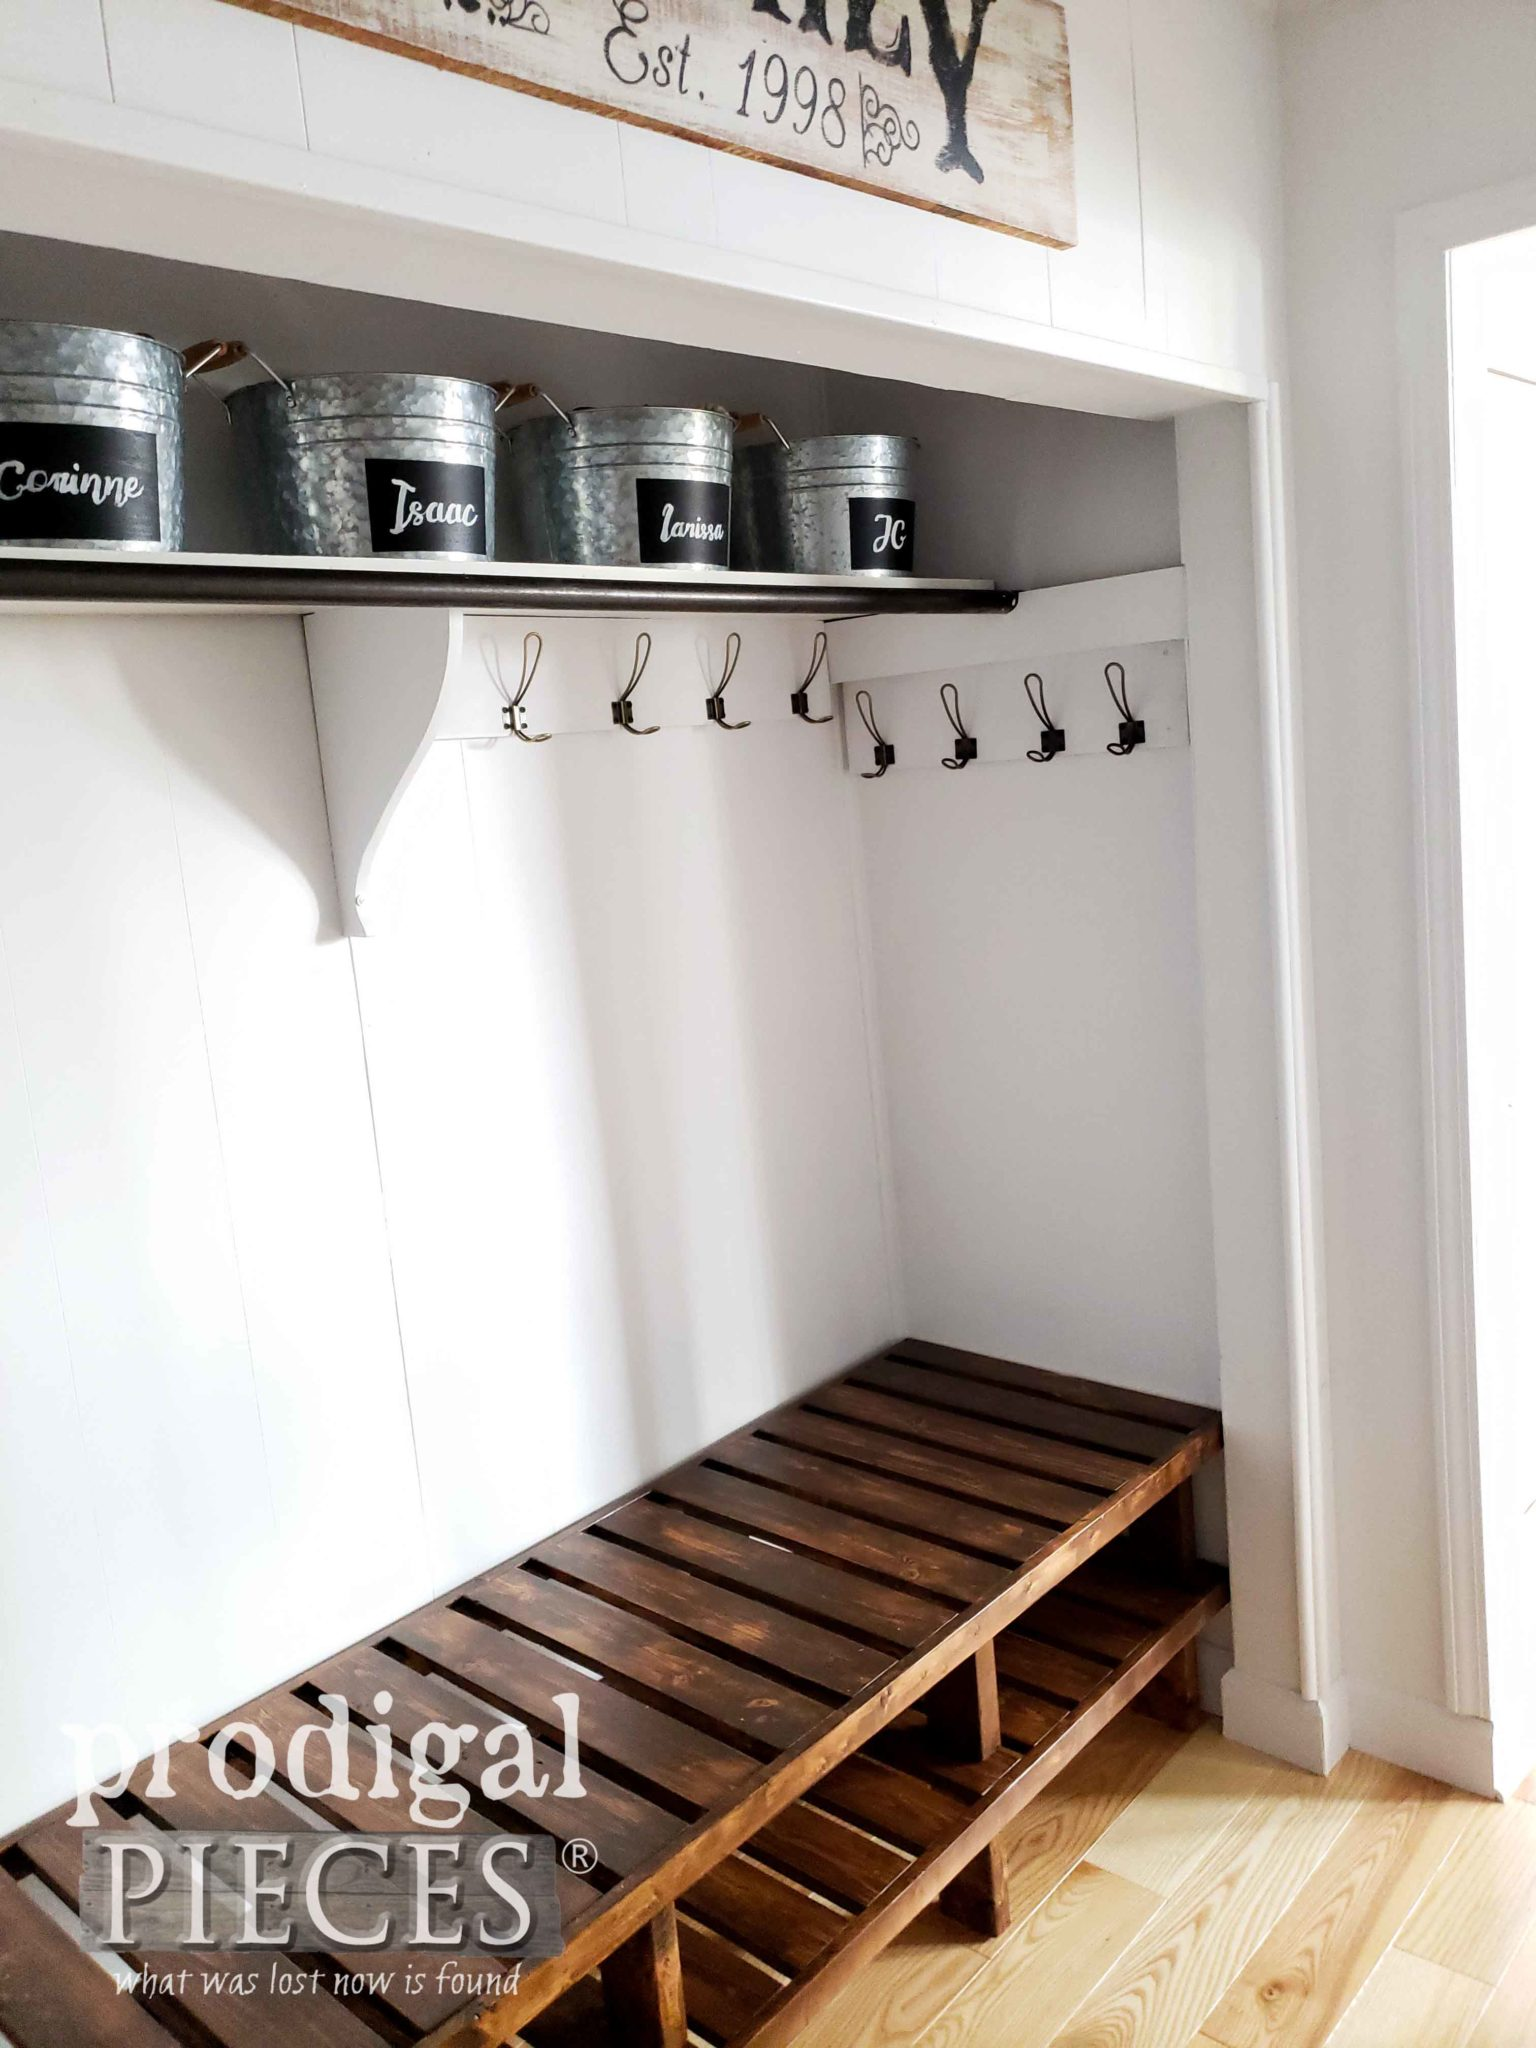 Custom Built Farmhouse Style Mudroom Bench by Larissa of Prodigal Pieces | prodigalpieces.com #prodigalpieces #diy #home #homedecor #farmhouse #storage